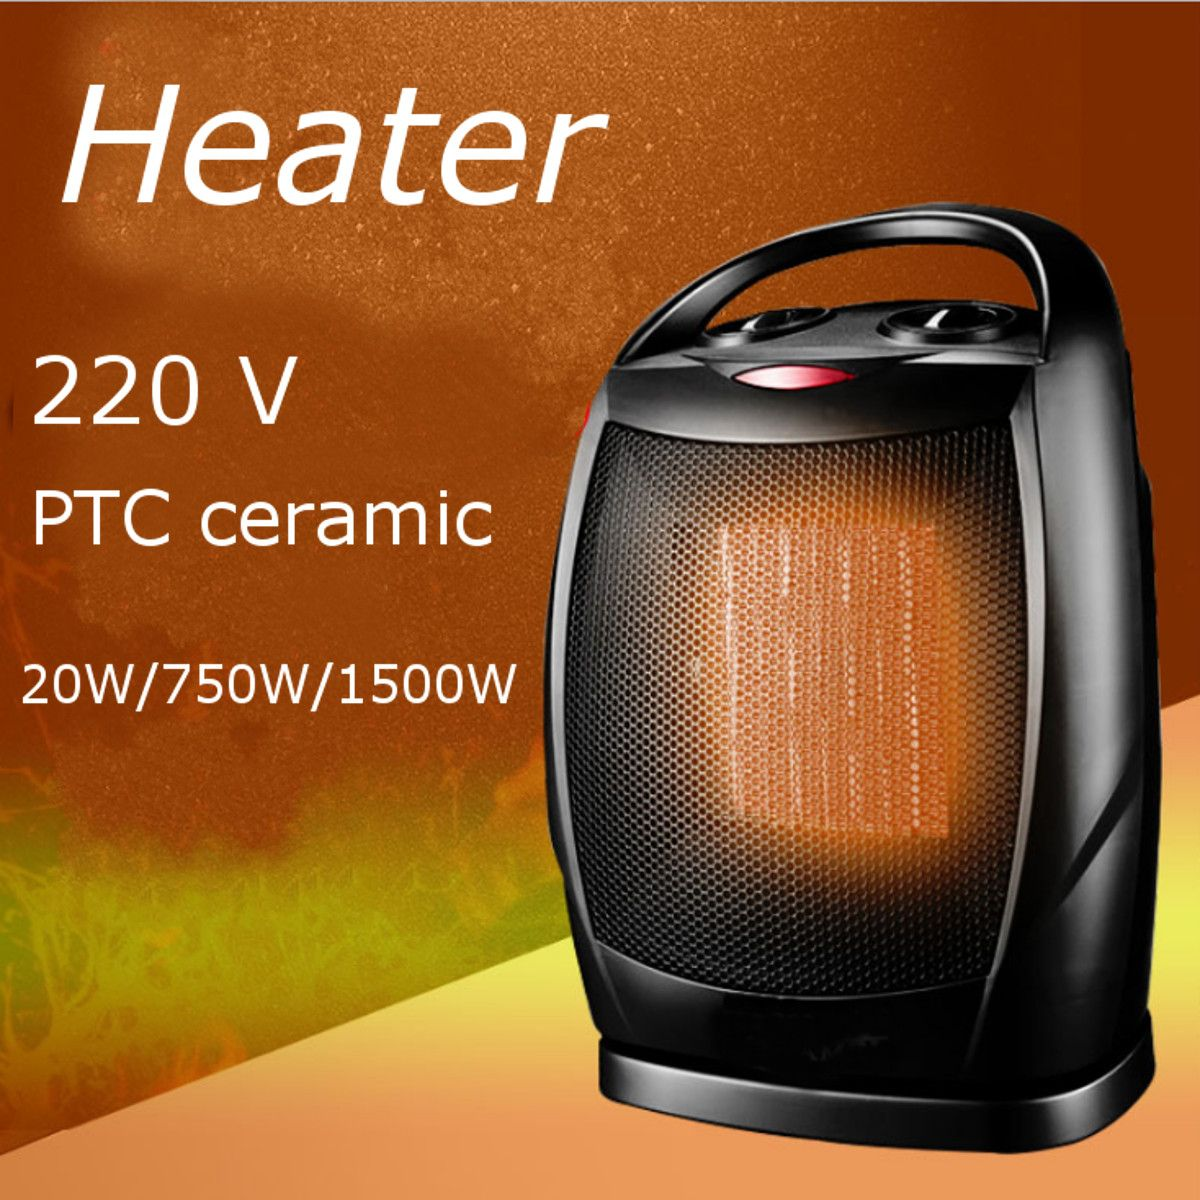 Indoor PTC Ceramic Electric Portable Heater Mini Energy Saving Desktop Fan Heater Shake Head Radiator Warmer With Thermostat